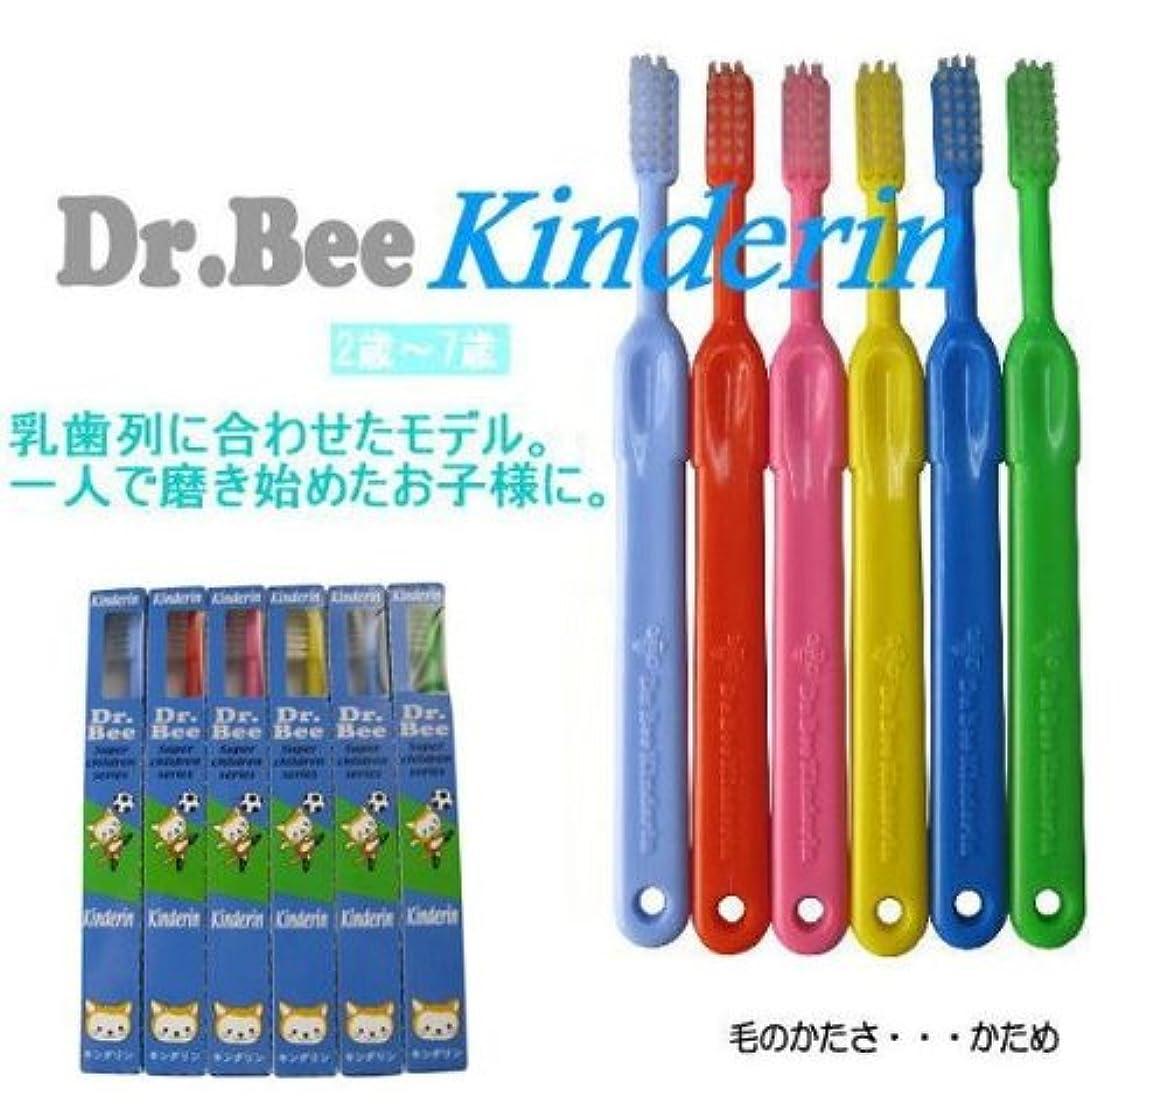 BeeBrand Dr.BEE 歯ブラシ キンダリン かため